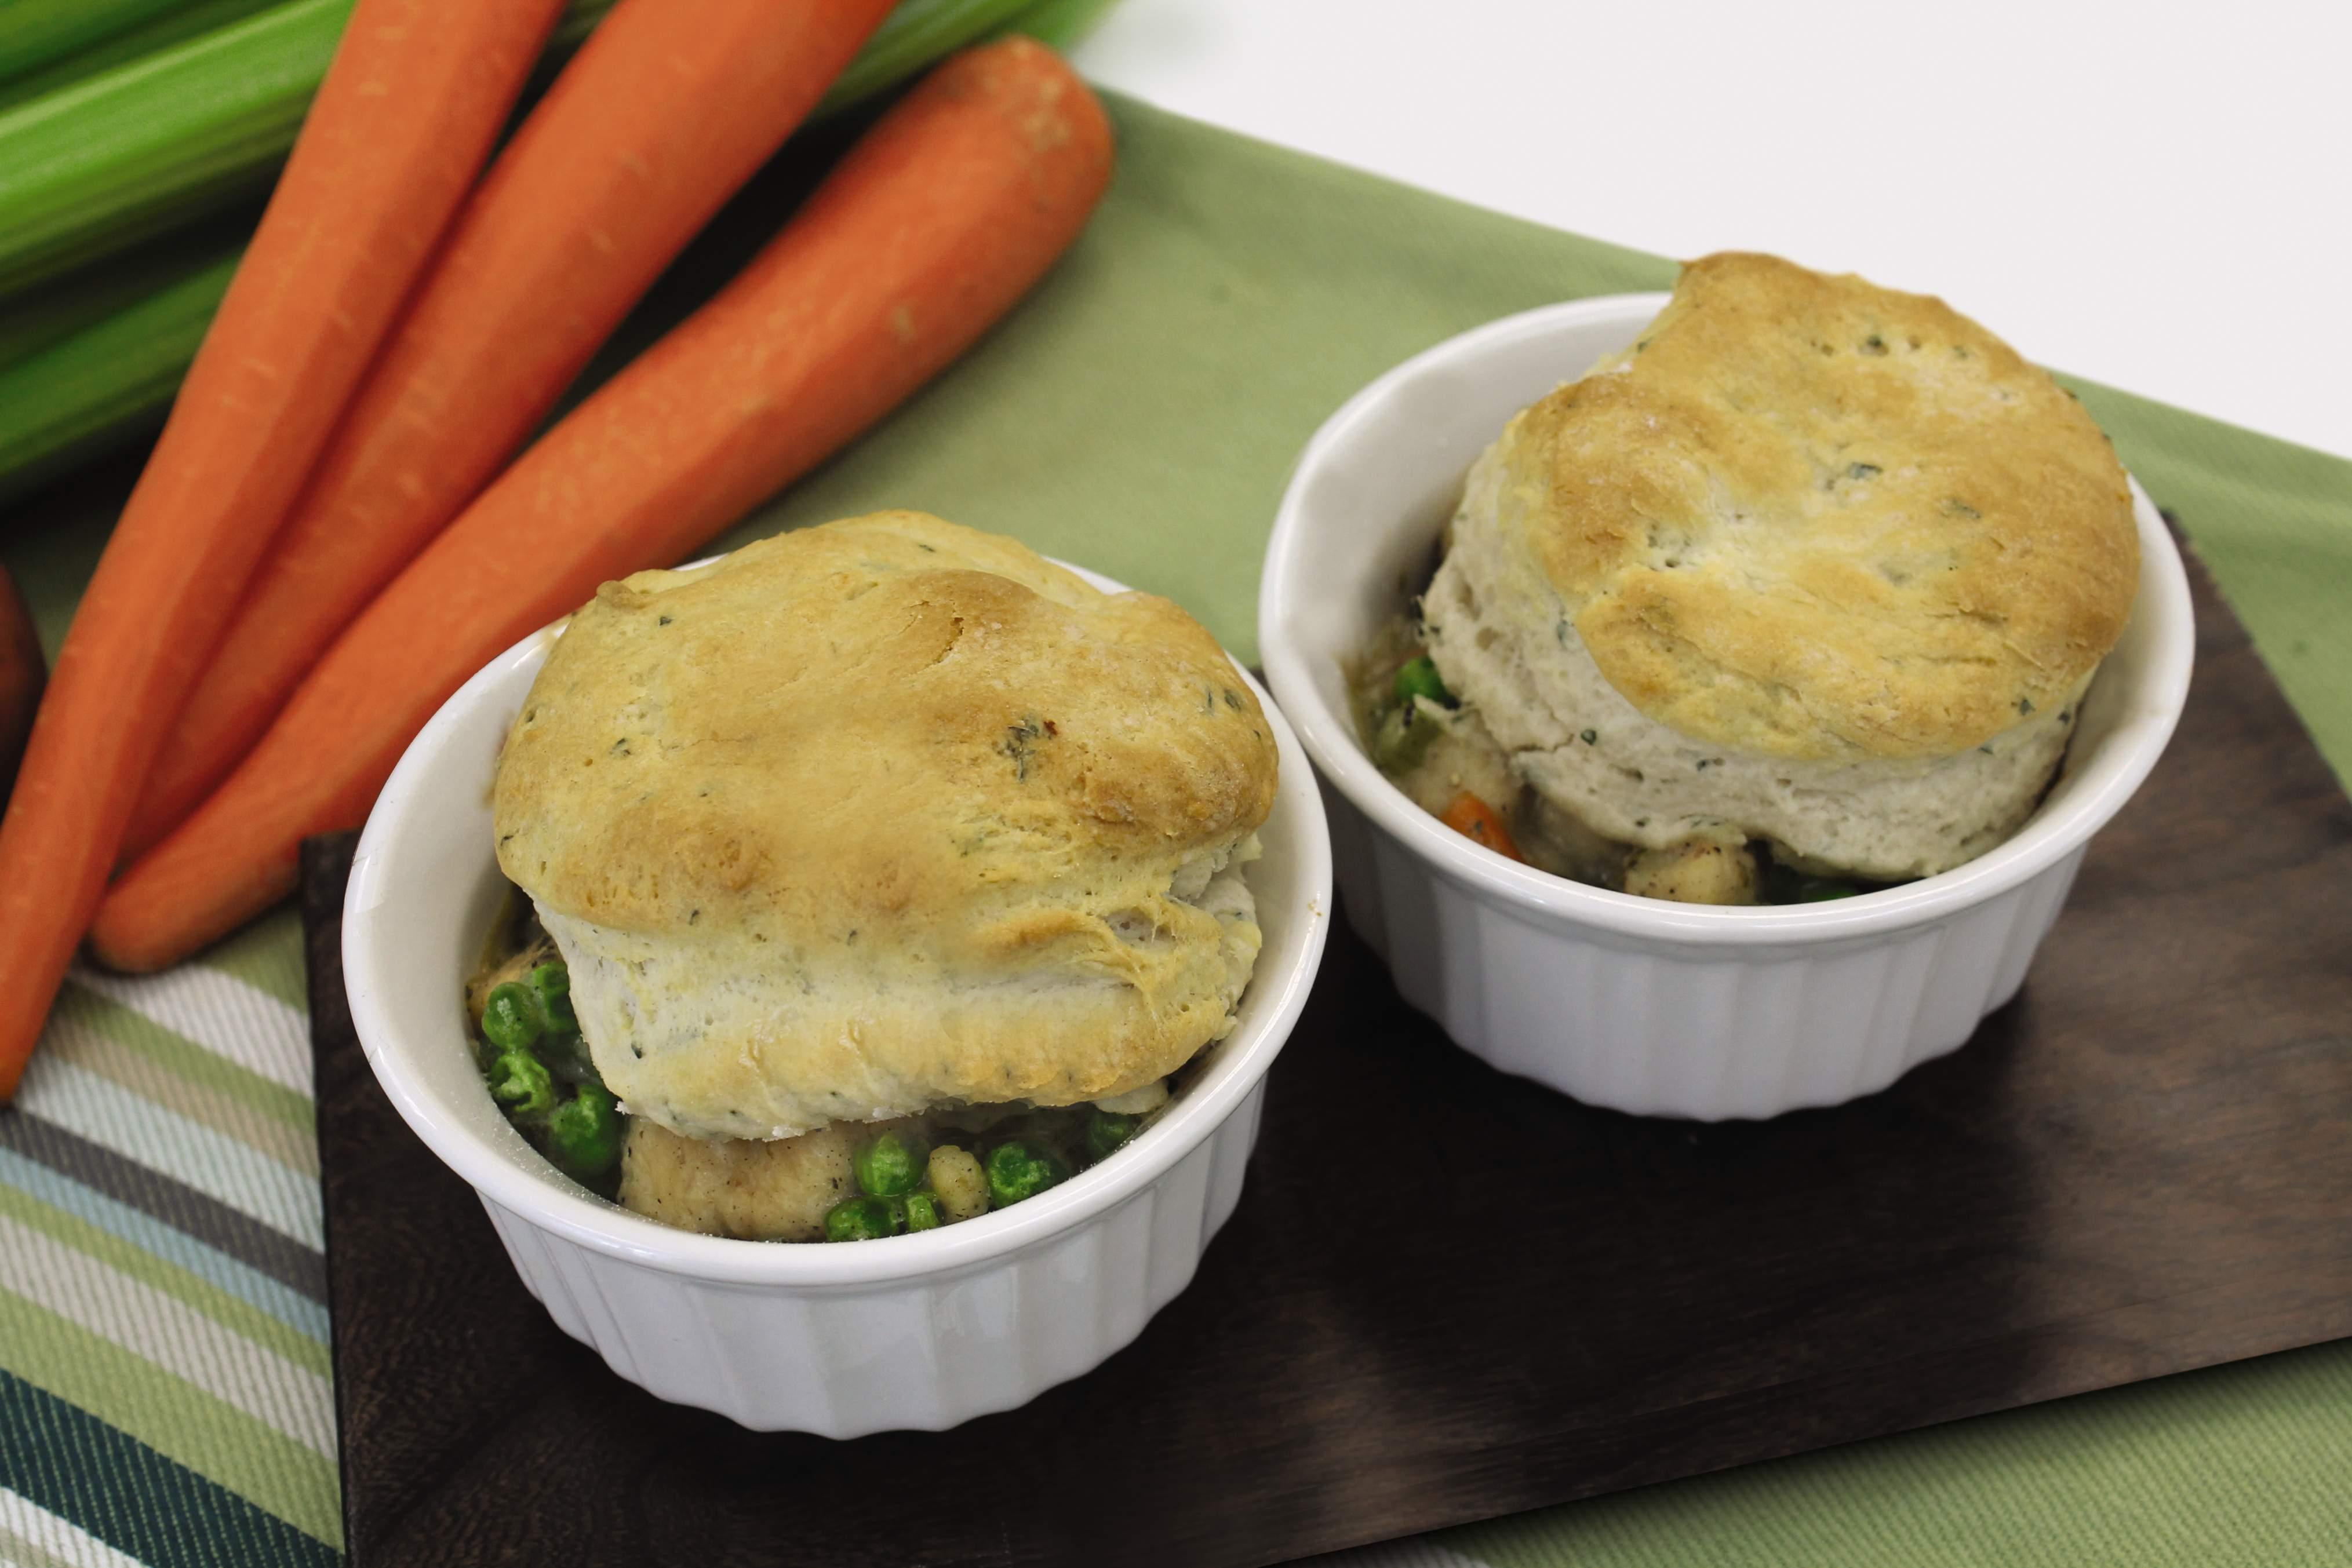 Dairy free chicken pot pie with herb biscuits.